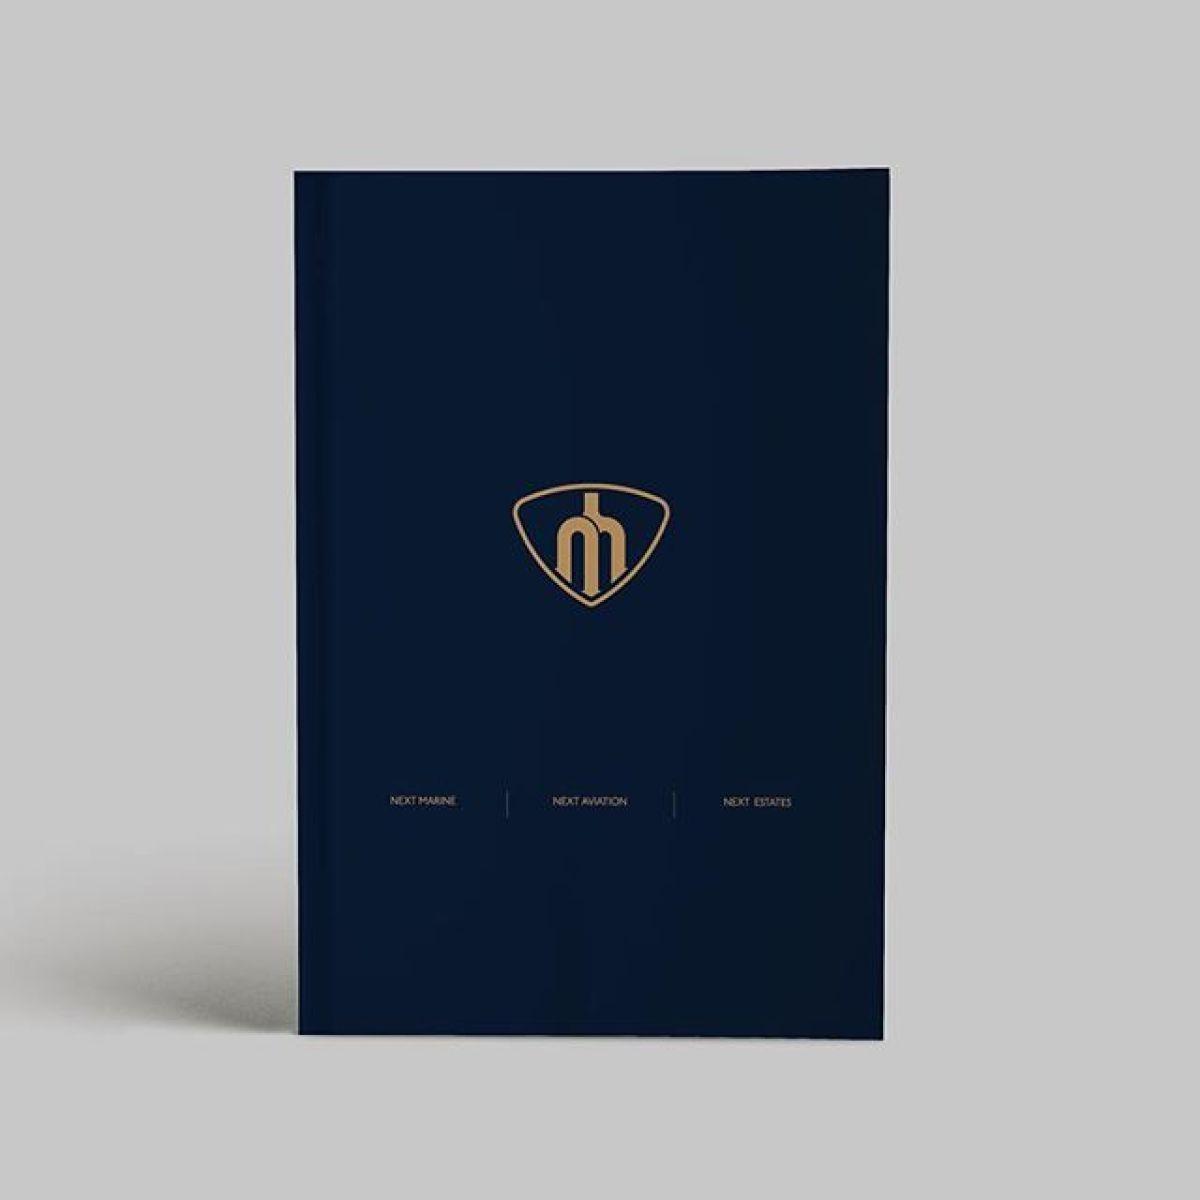 New work coming soon..#logo #brand #branding #design #graphicdesign #graphicdesigner #agency #marine #sailing #yacht